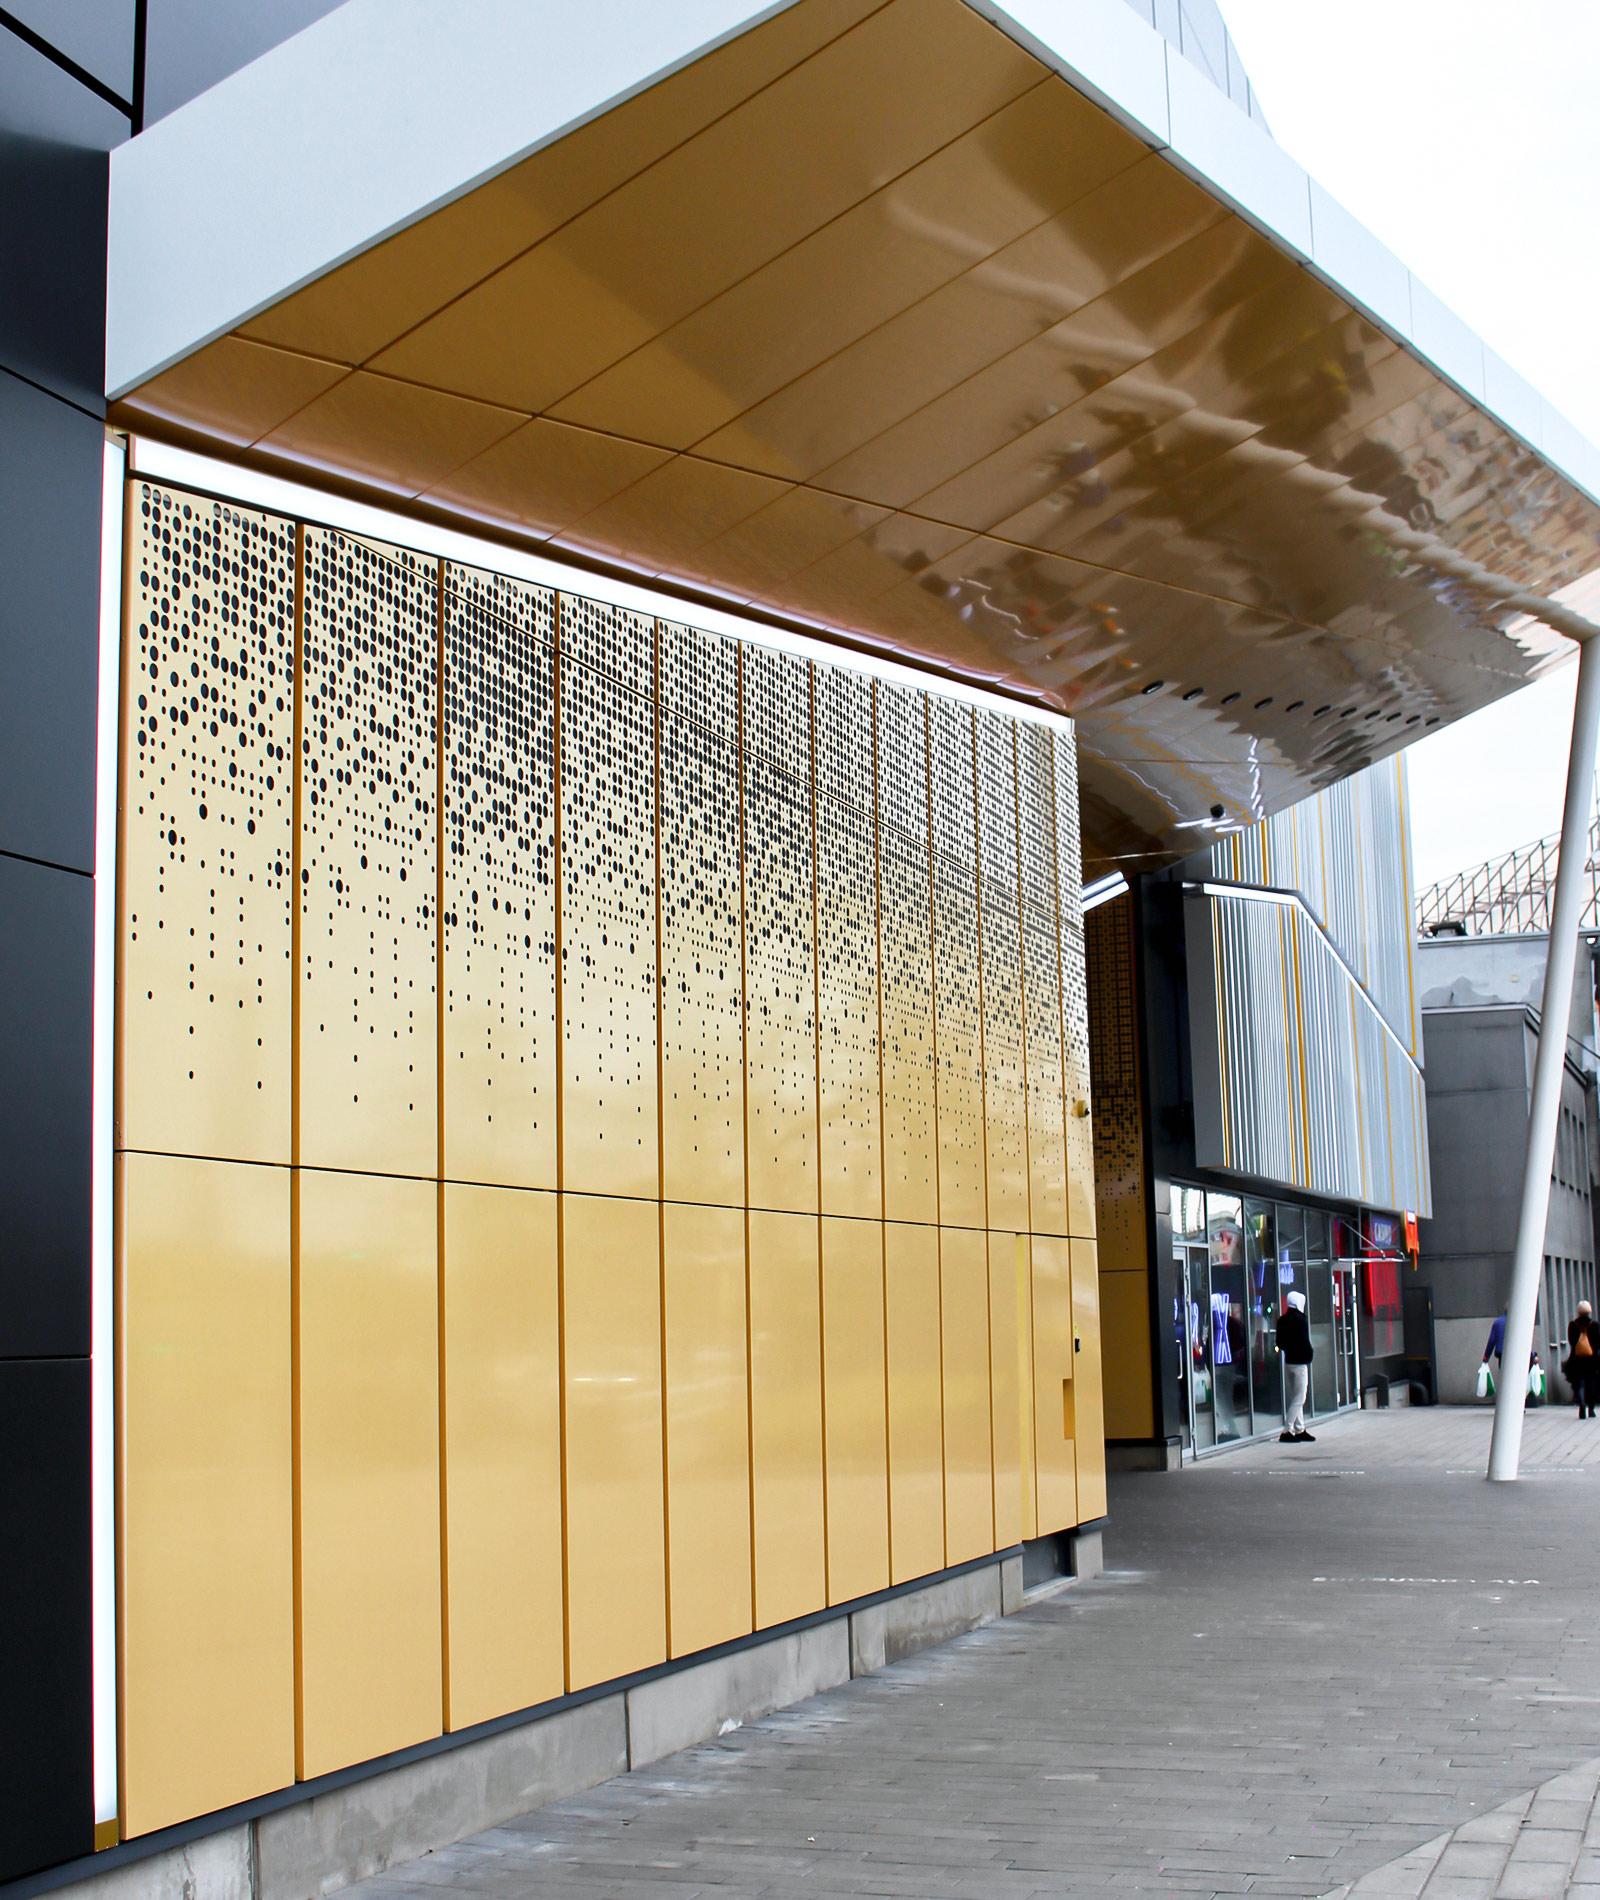 kristiine-shopping-centre-detail-STB-4D8